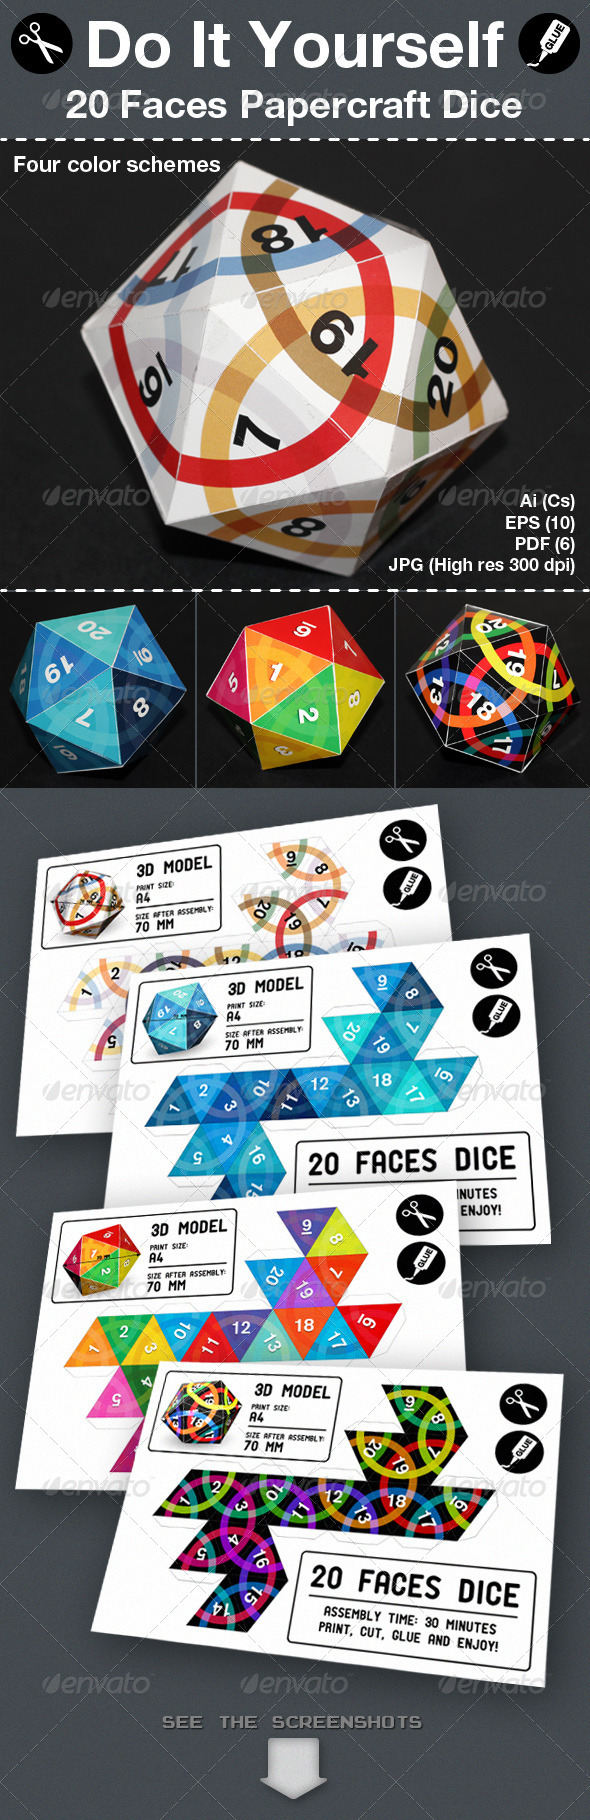 Twenty Faces Papercraft Dice - Packaging Print Templates